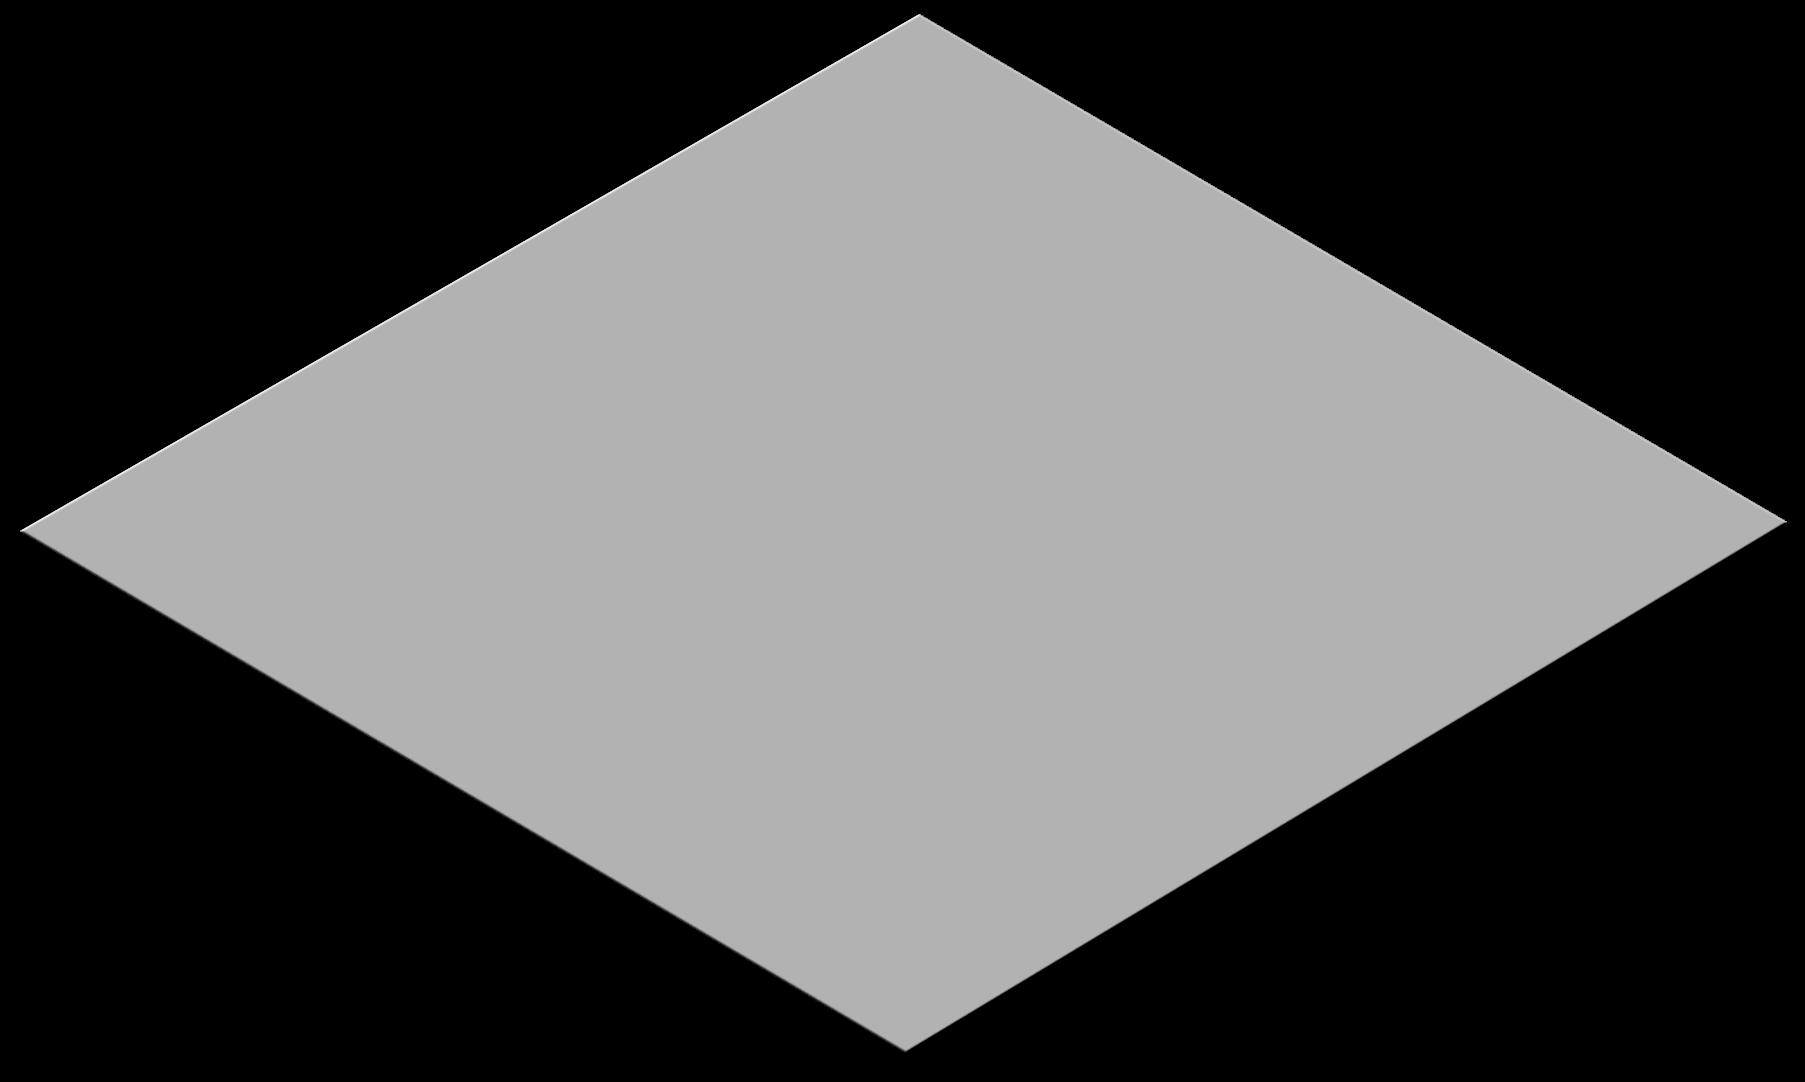 Diamond Shape PNG HD - 128788